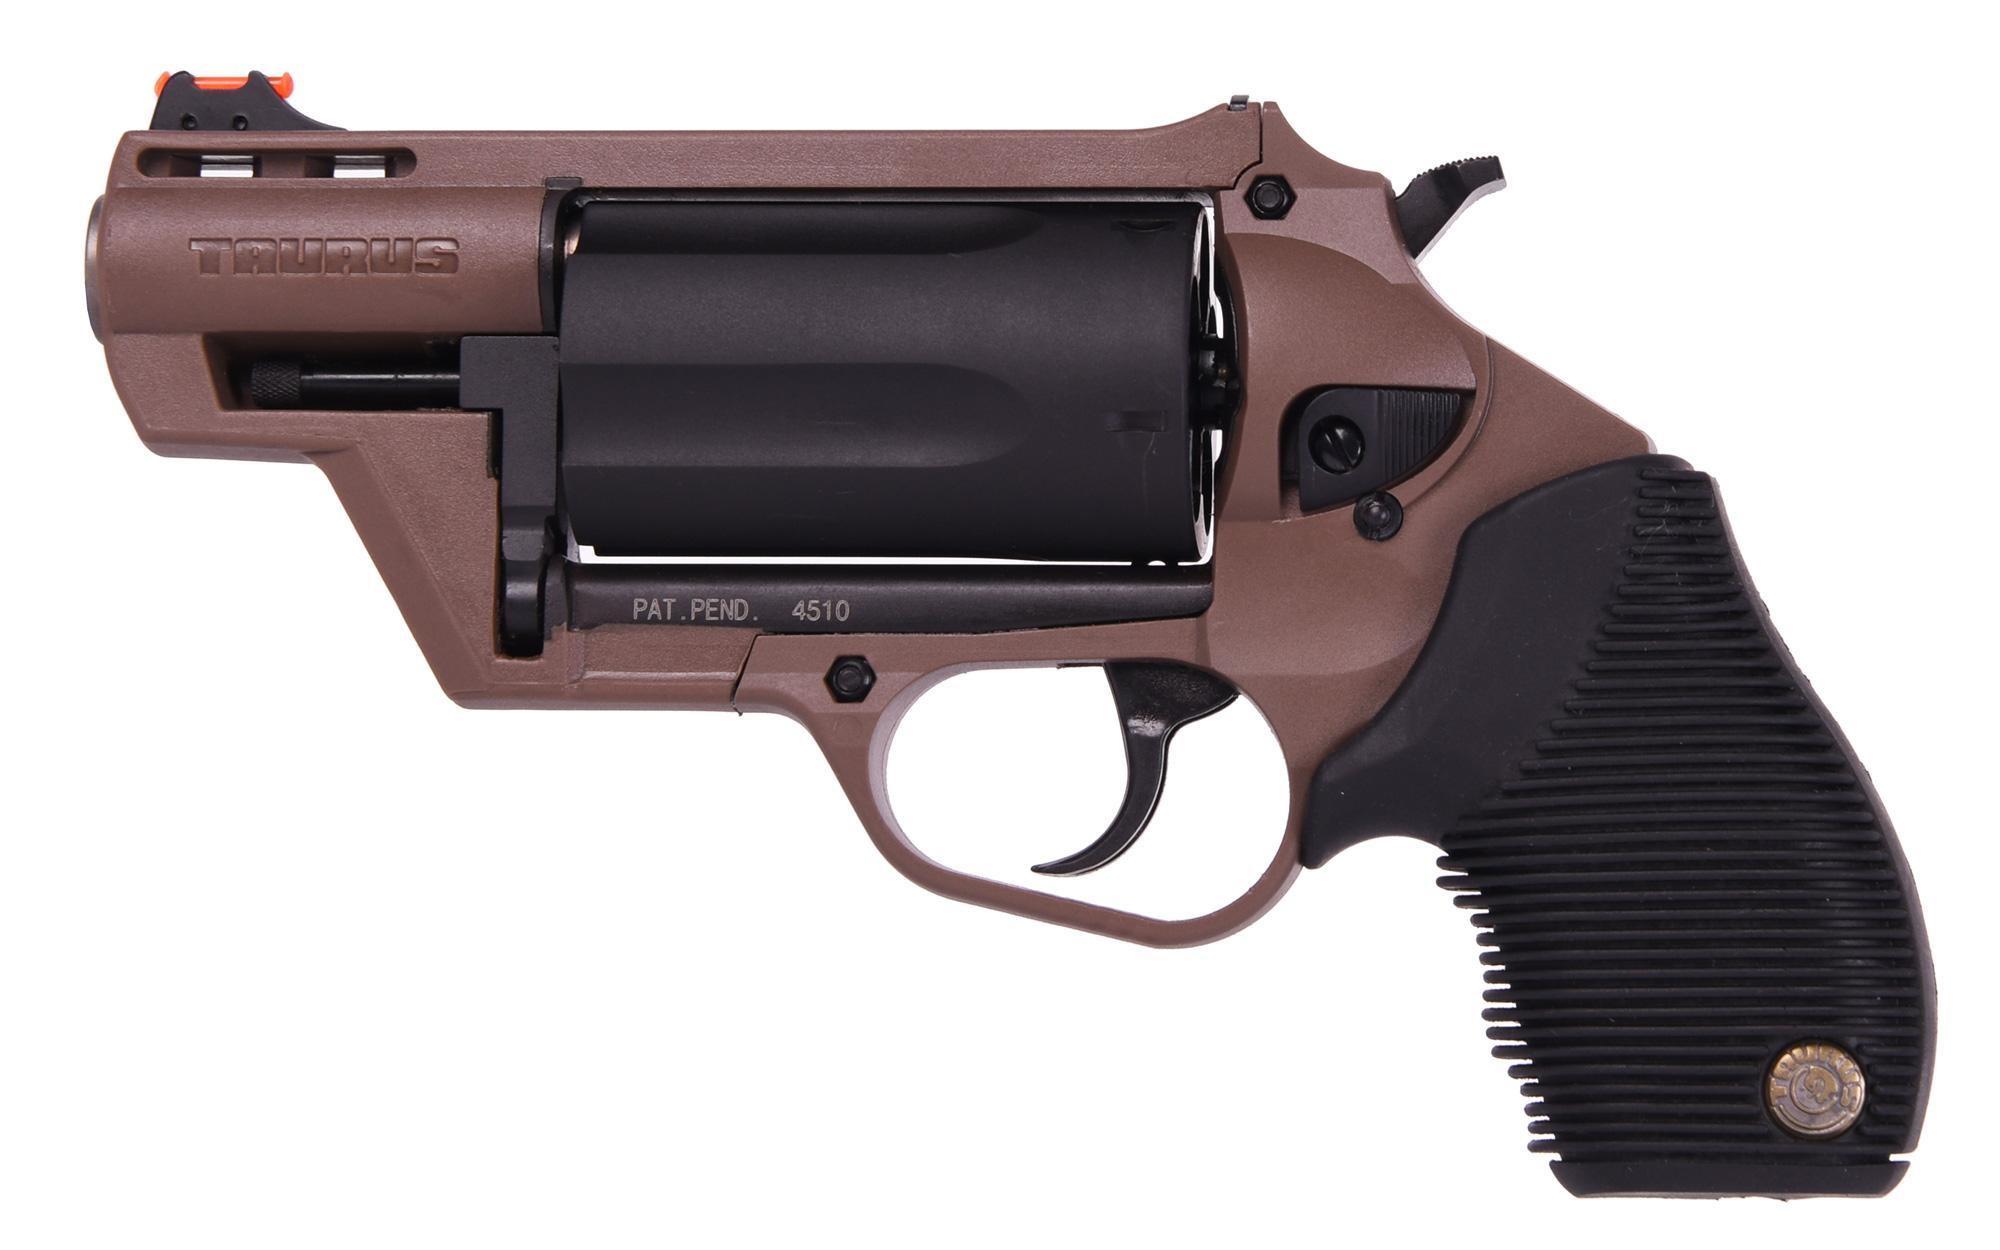 PUB DEF POLY 410/45 BROWN/BLK - 2-441021B